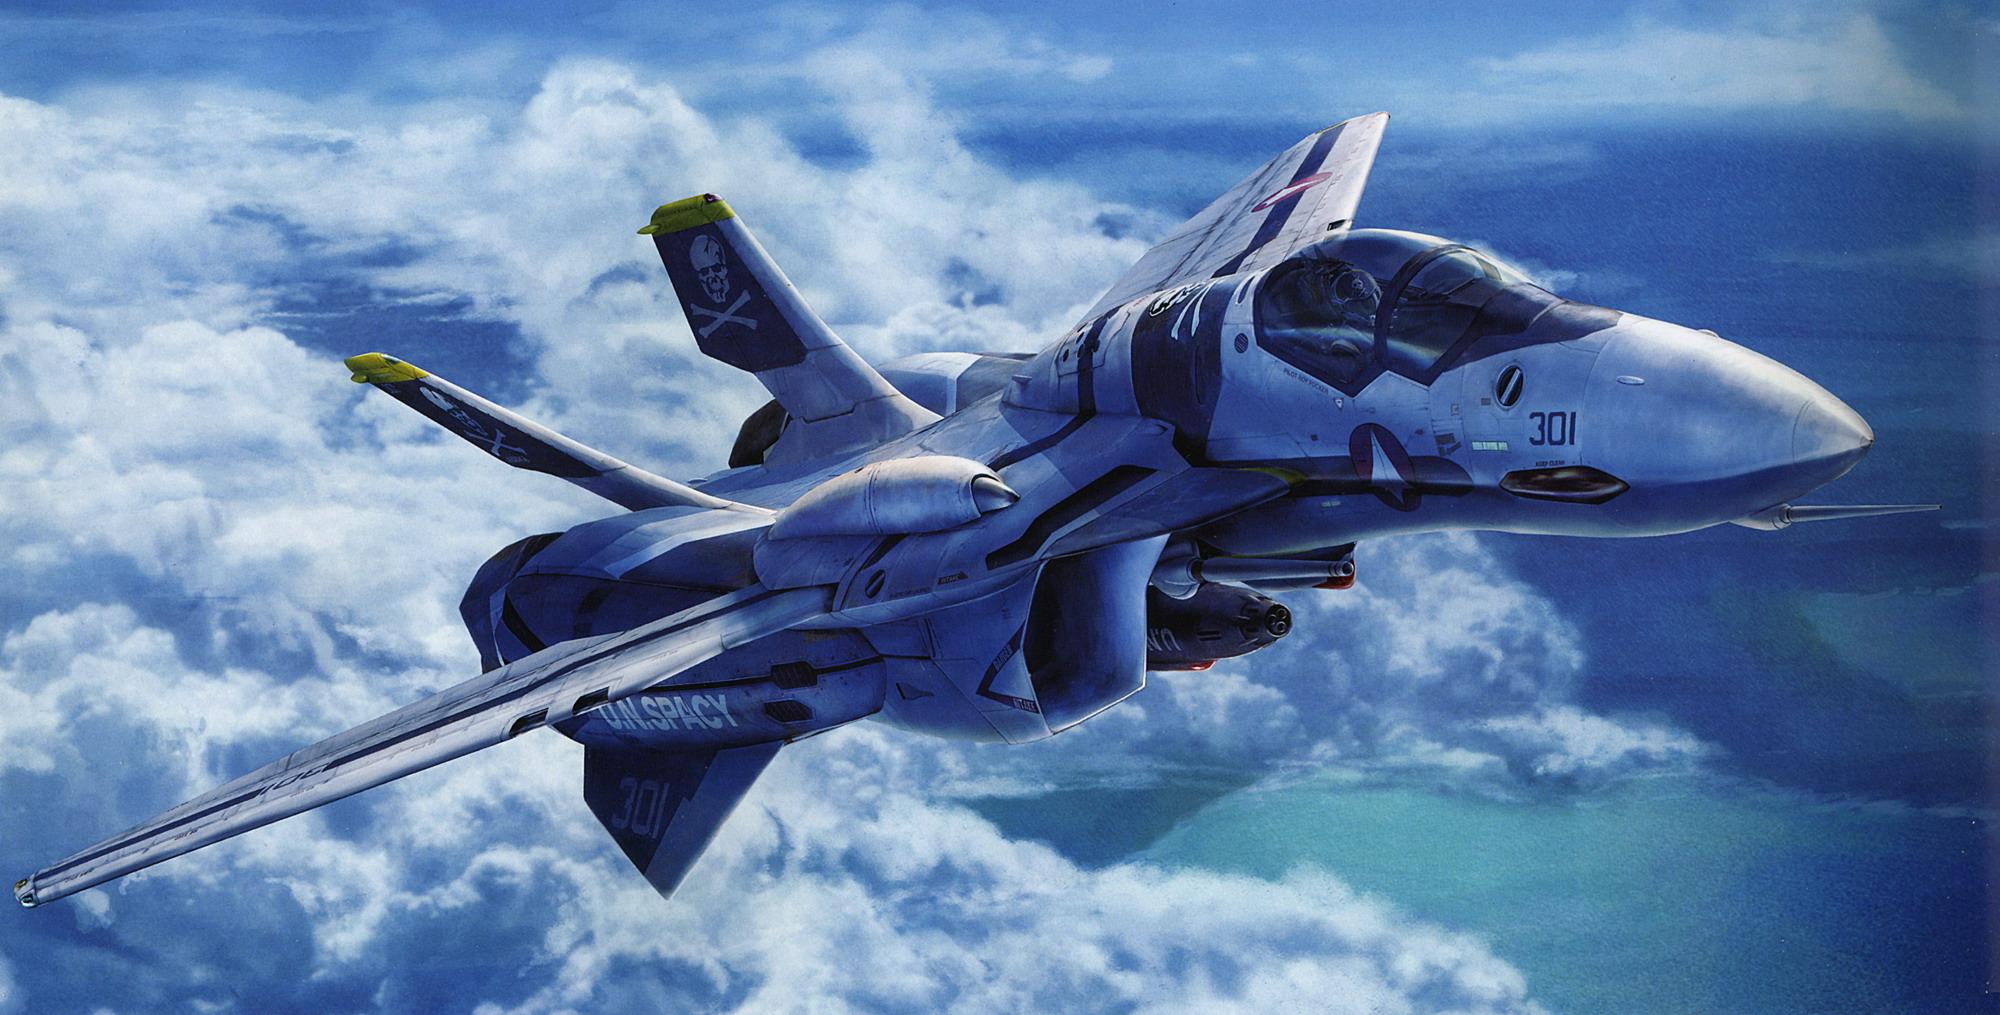 Ace Combat Assault Horizon Wallpapers For Xbox 360 2000x1015